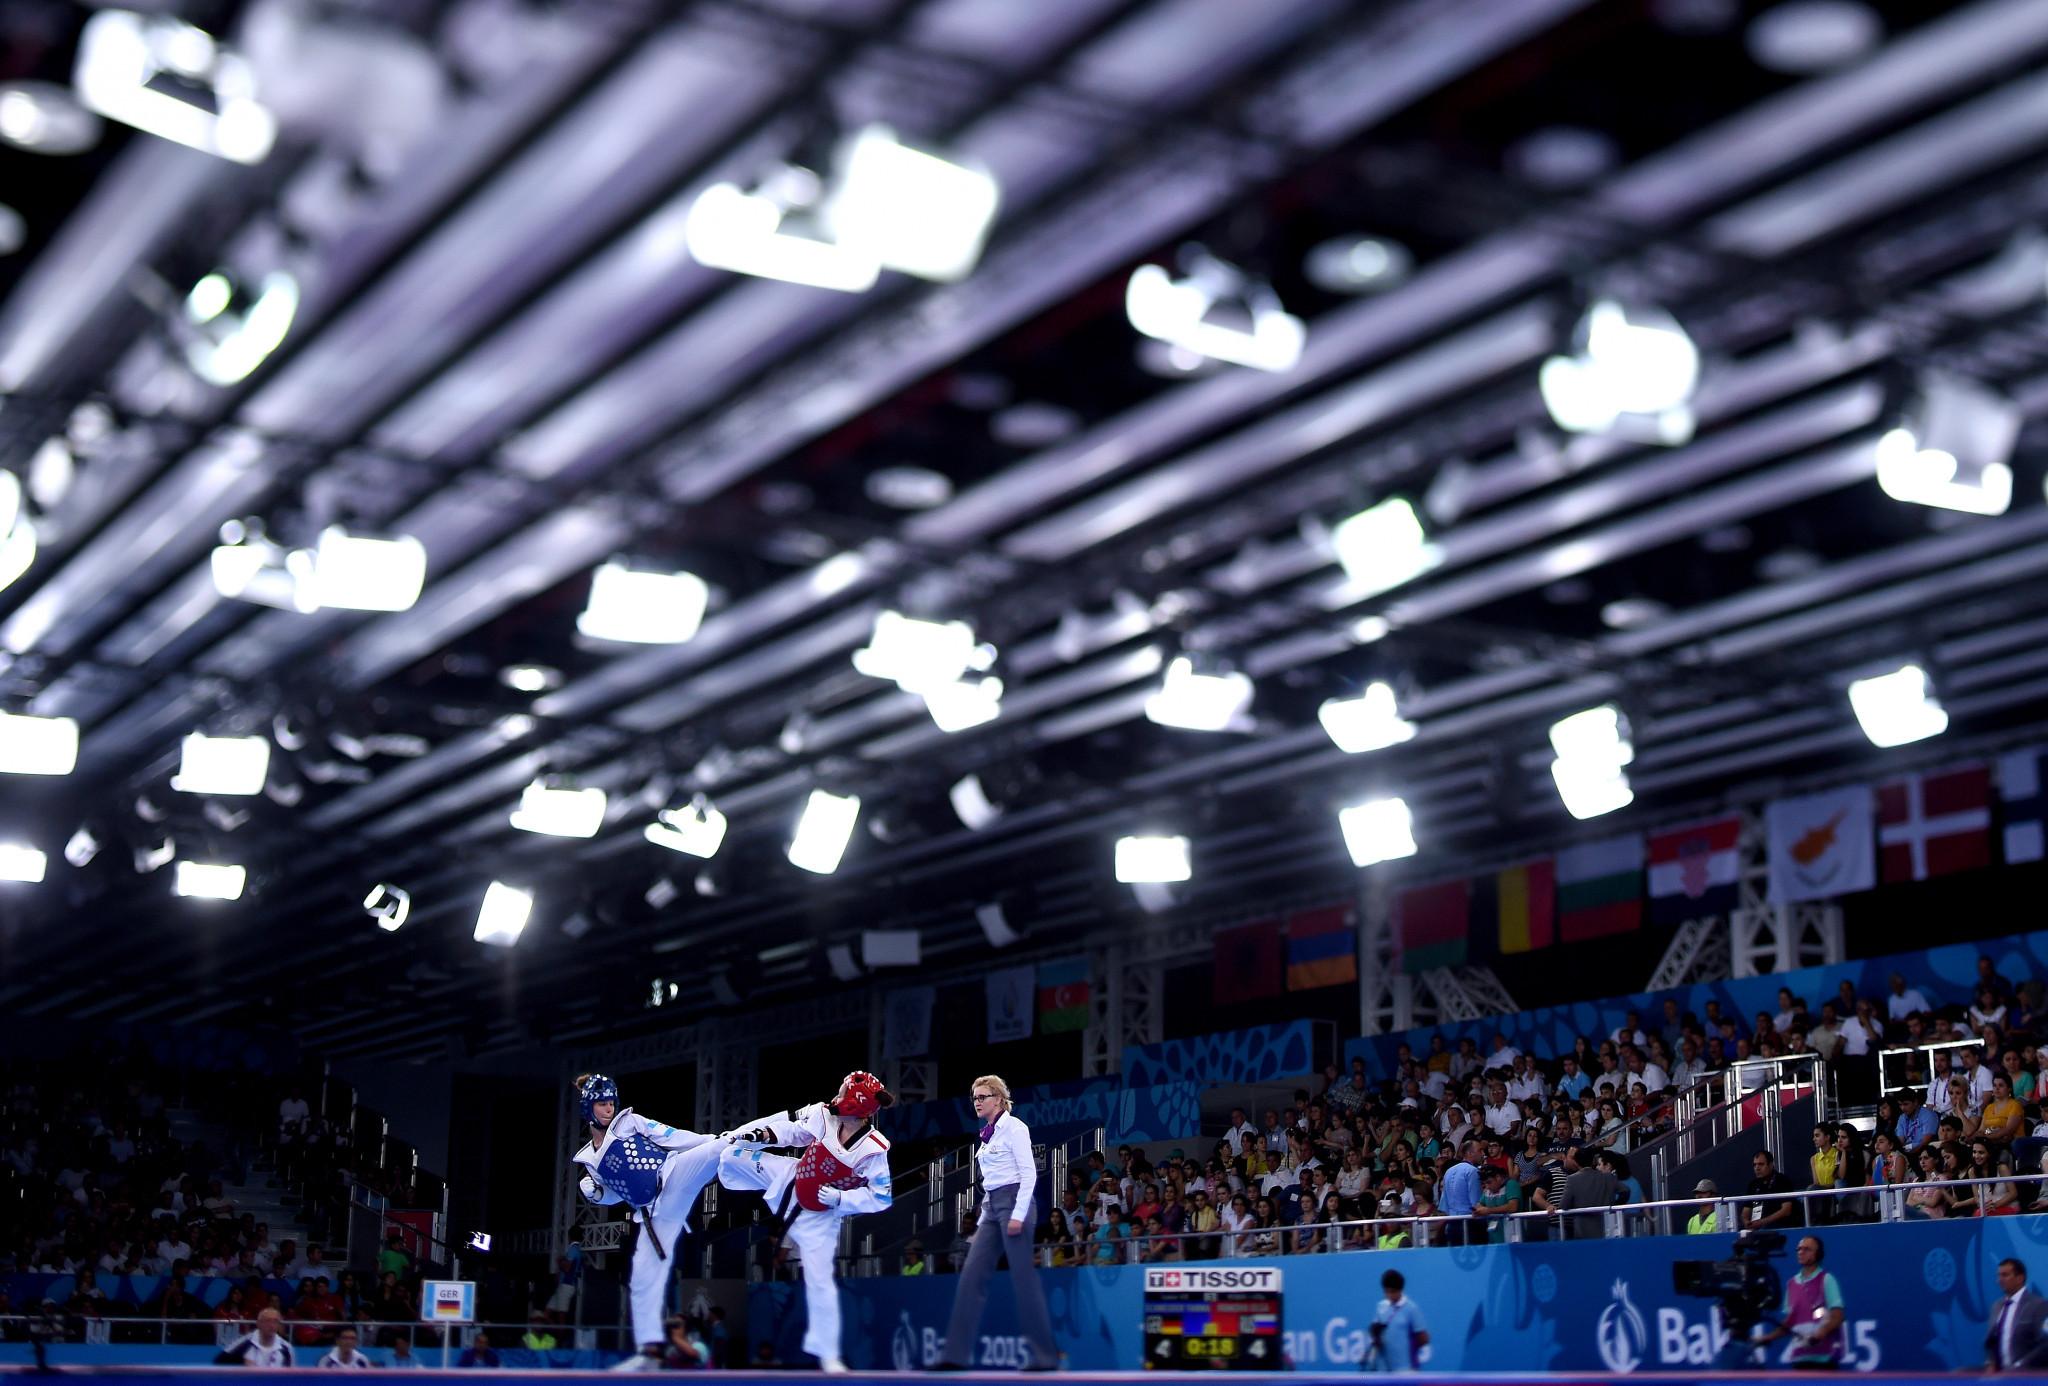 German Taekwondo Union holds fifth week of online training programme